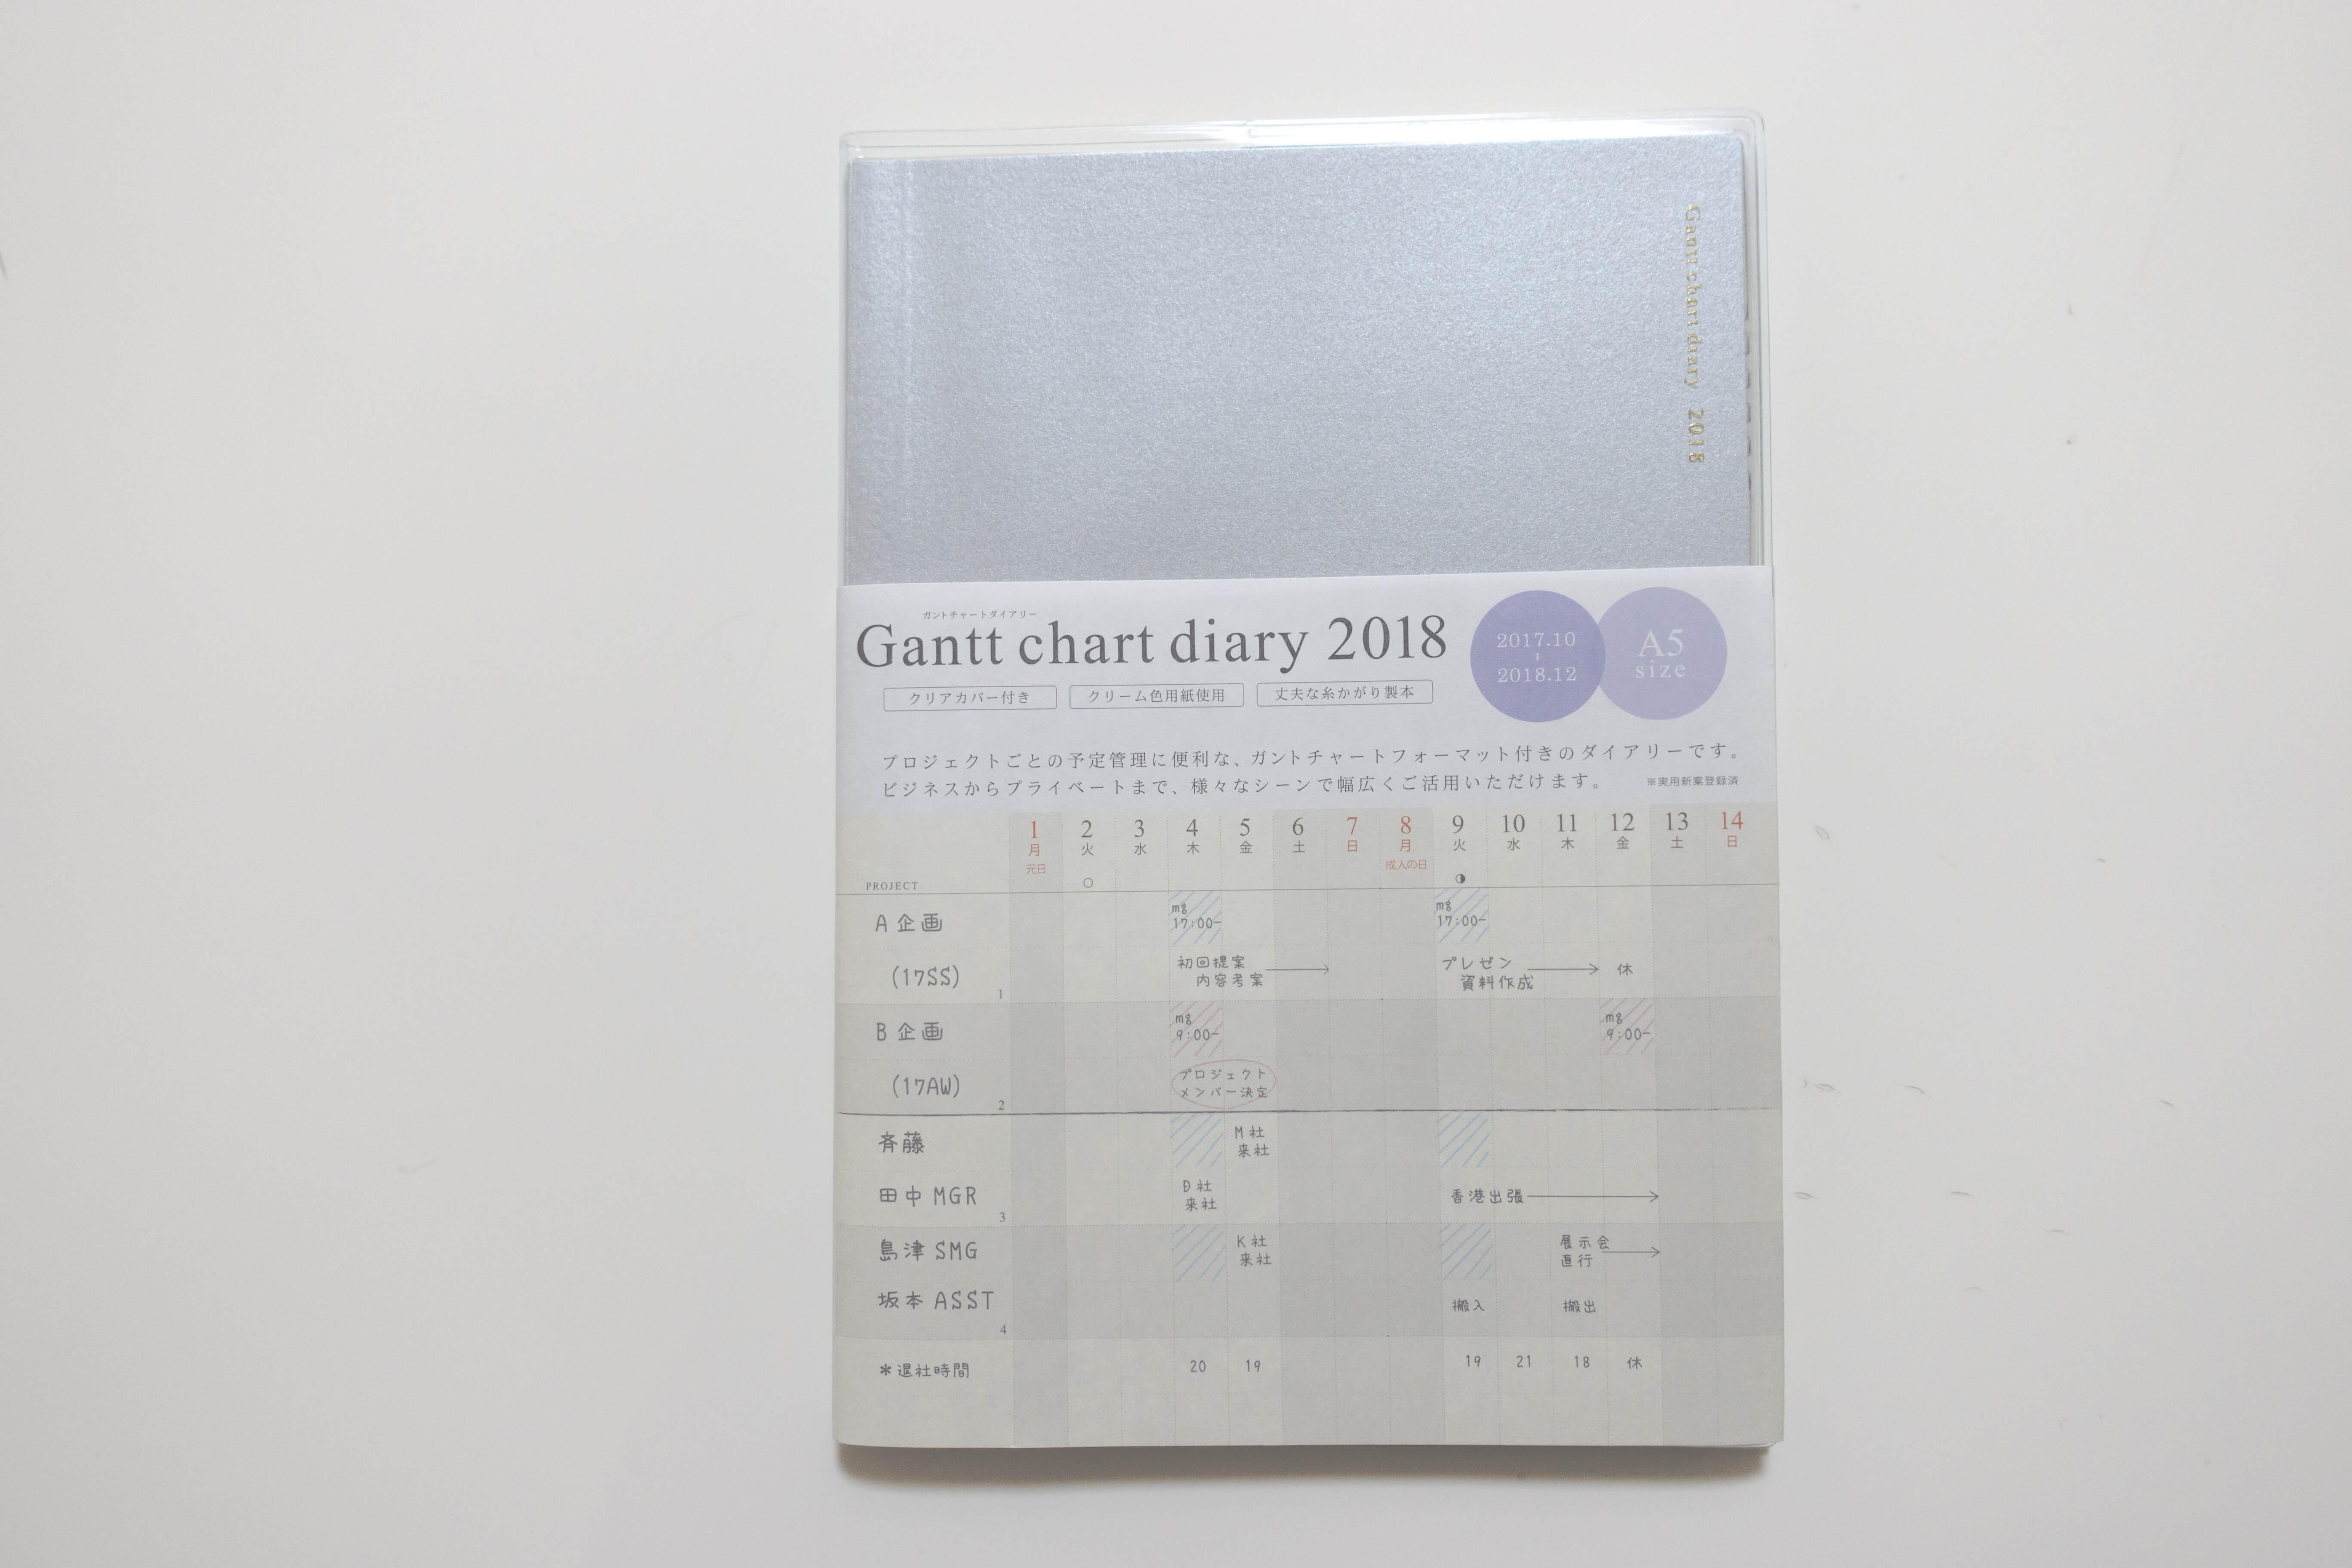 180107 gant chart diary 02